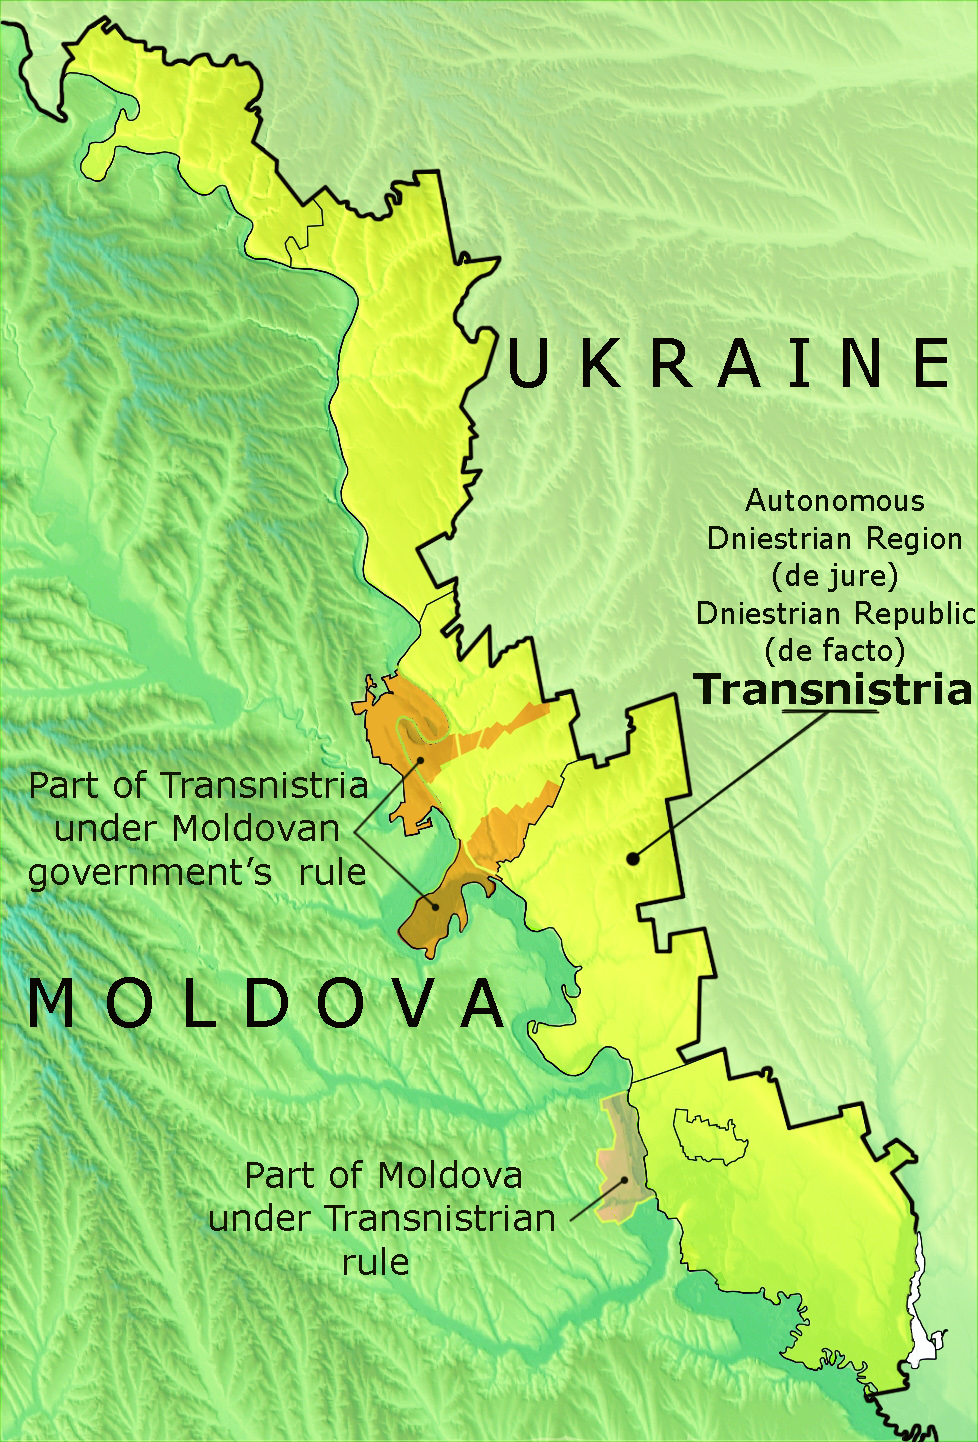 Transnistria [Wikipedia]